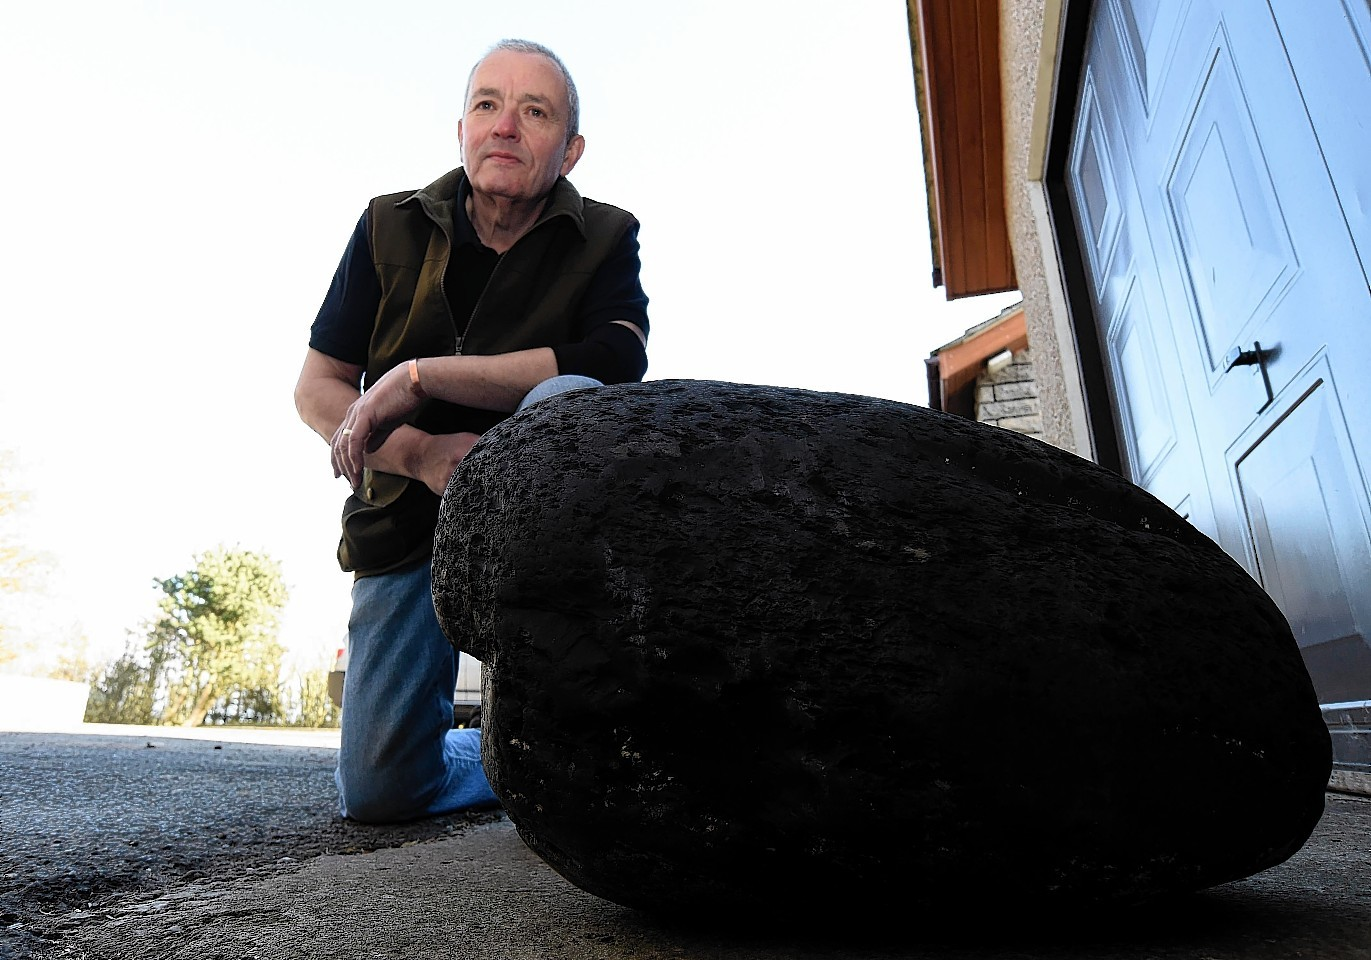 Ian Tait with the massive chunk of coal